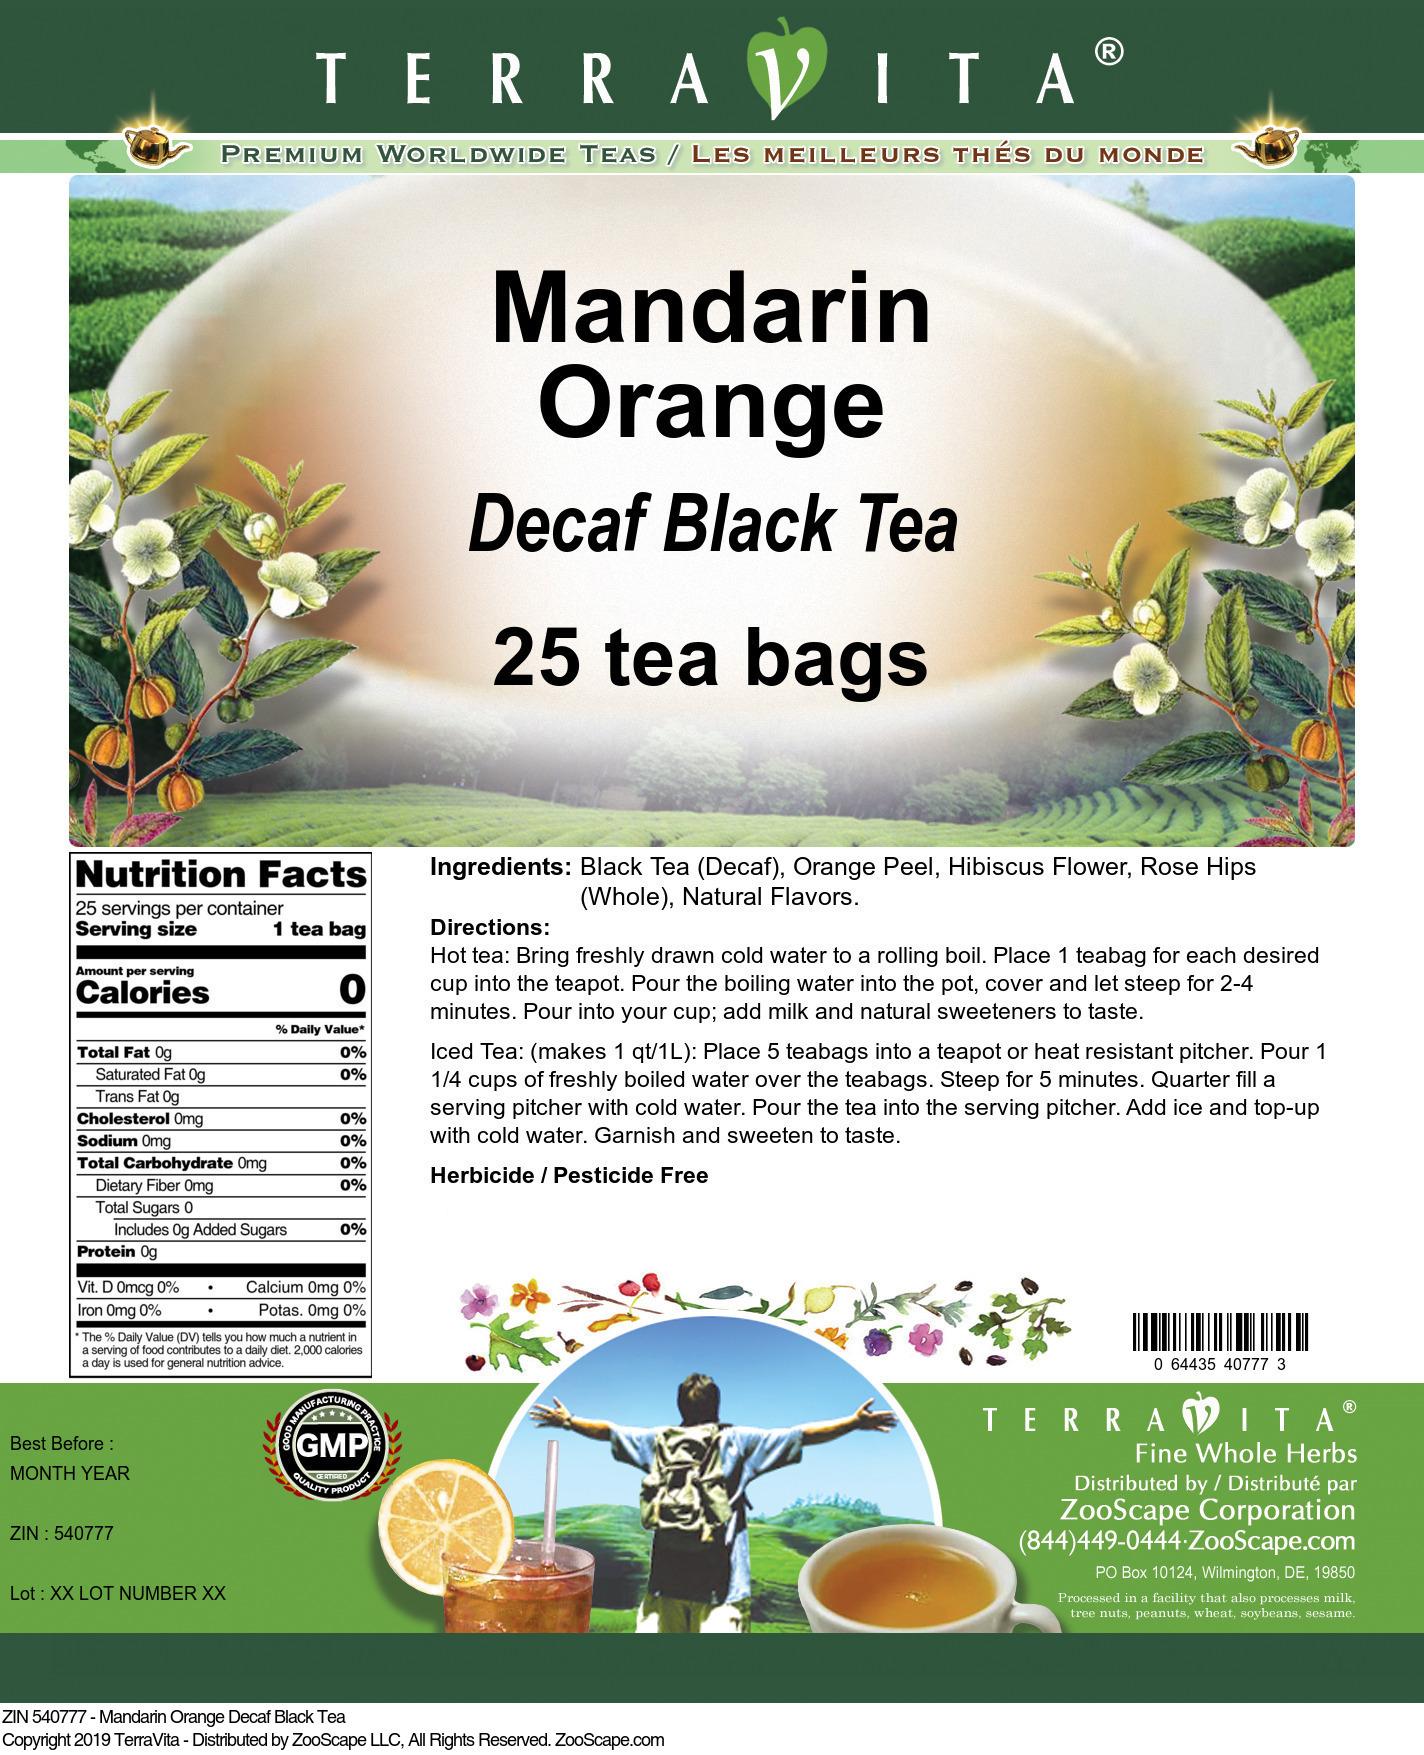 Mandarin Orange Decaf Black Tea